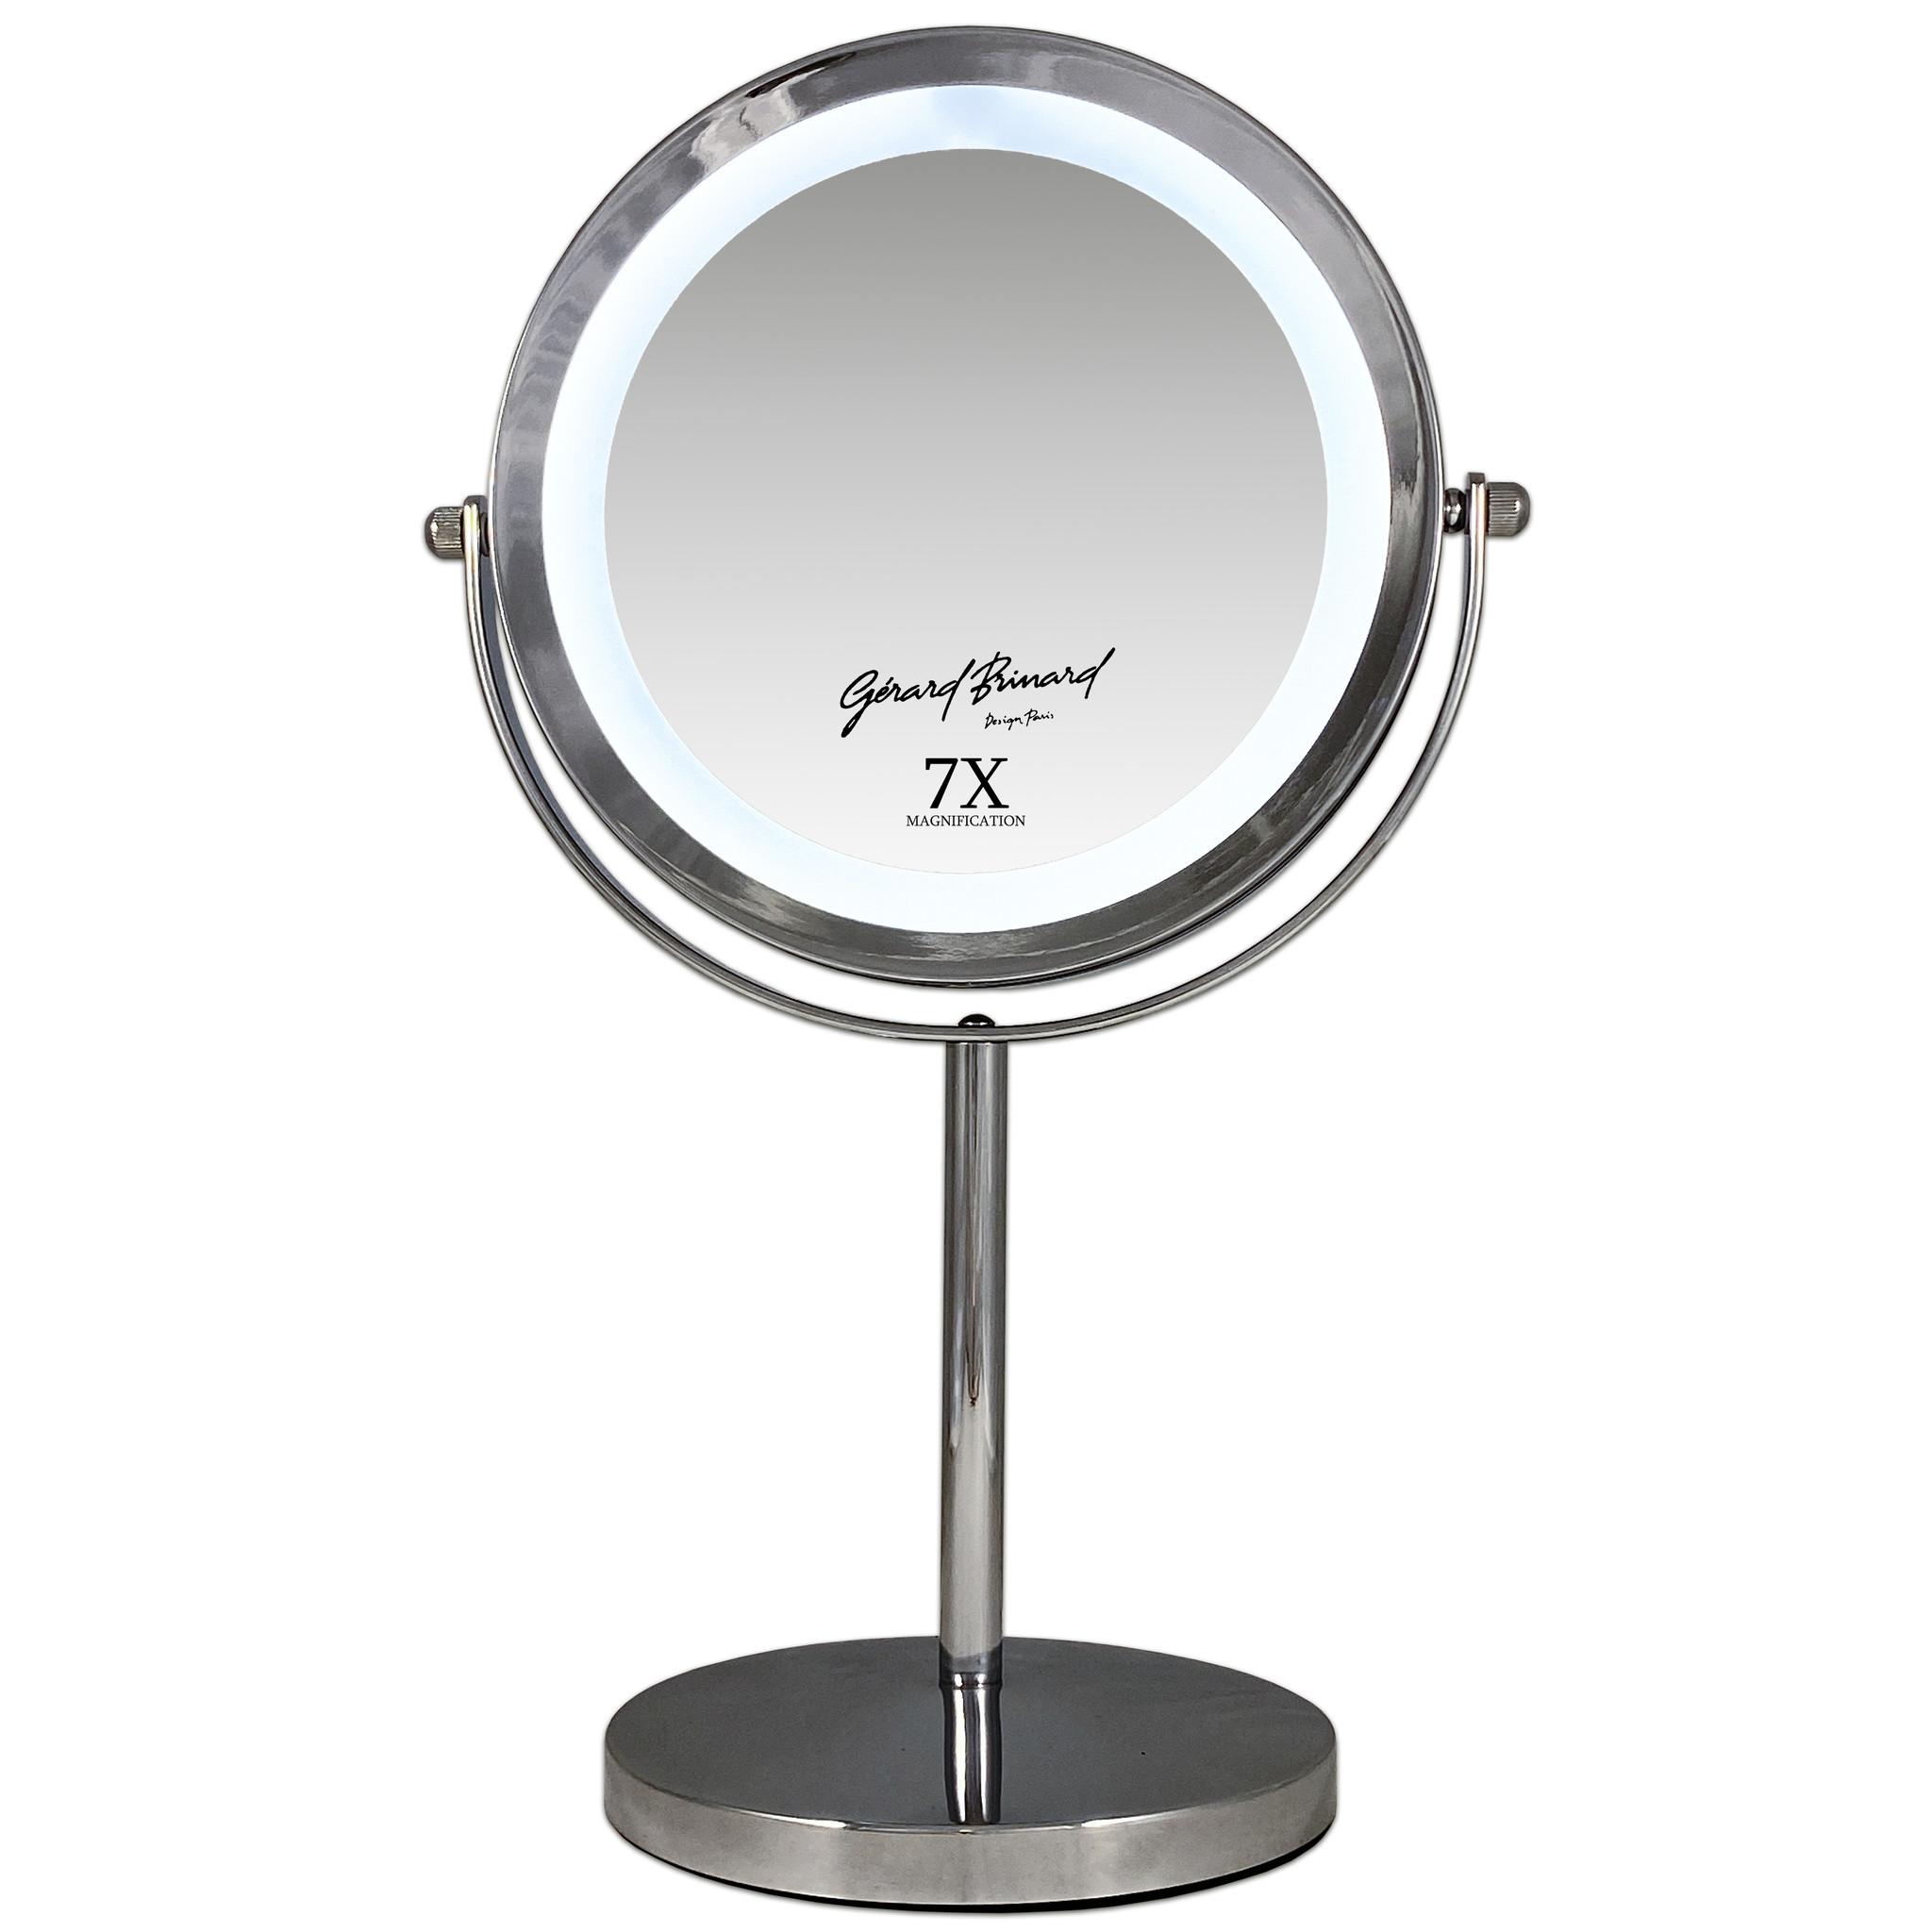 Gérard Brinard Metalen make-up LED spiegel dubbelzijdig 17,5CMØ 7x vergroting